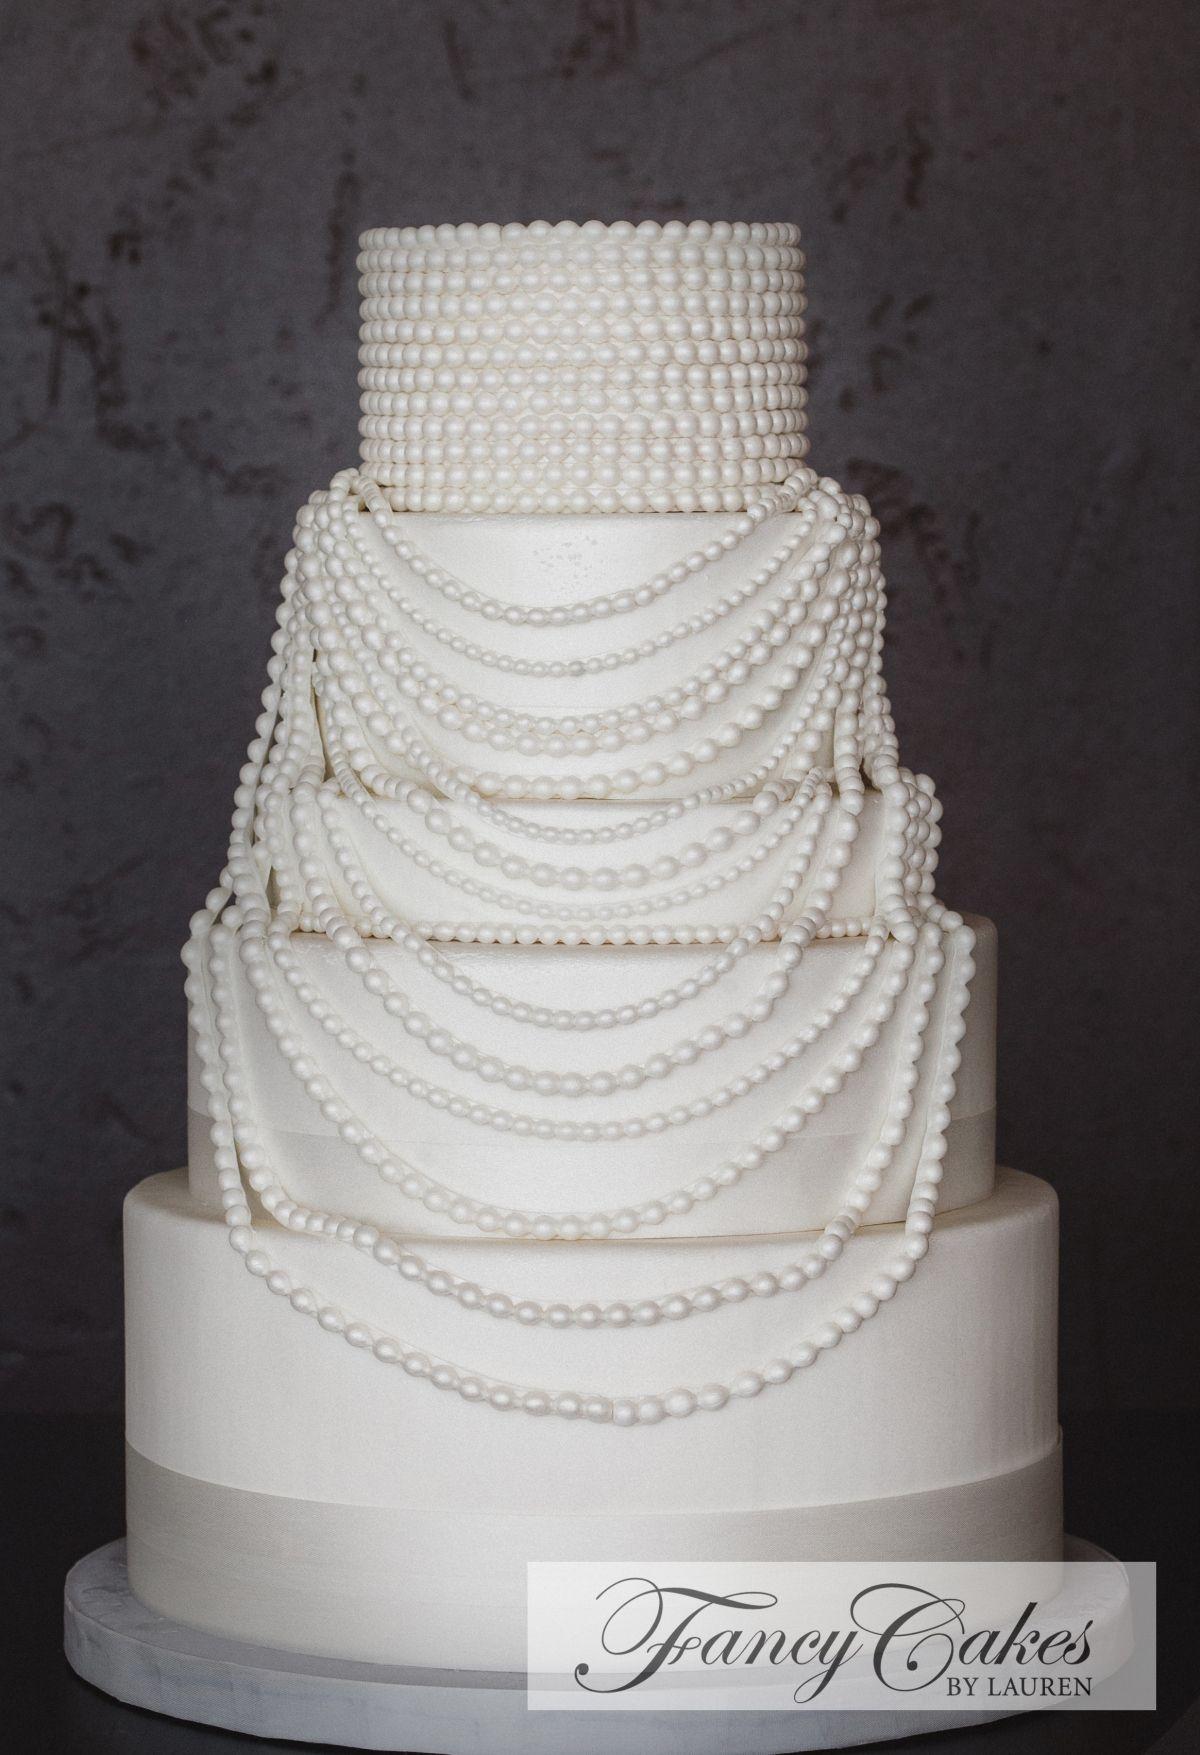 Speakeasy Pearl Necklace Wedding Cake | Cakes | Pinterest | Pearl ...